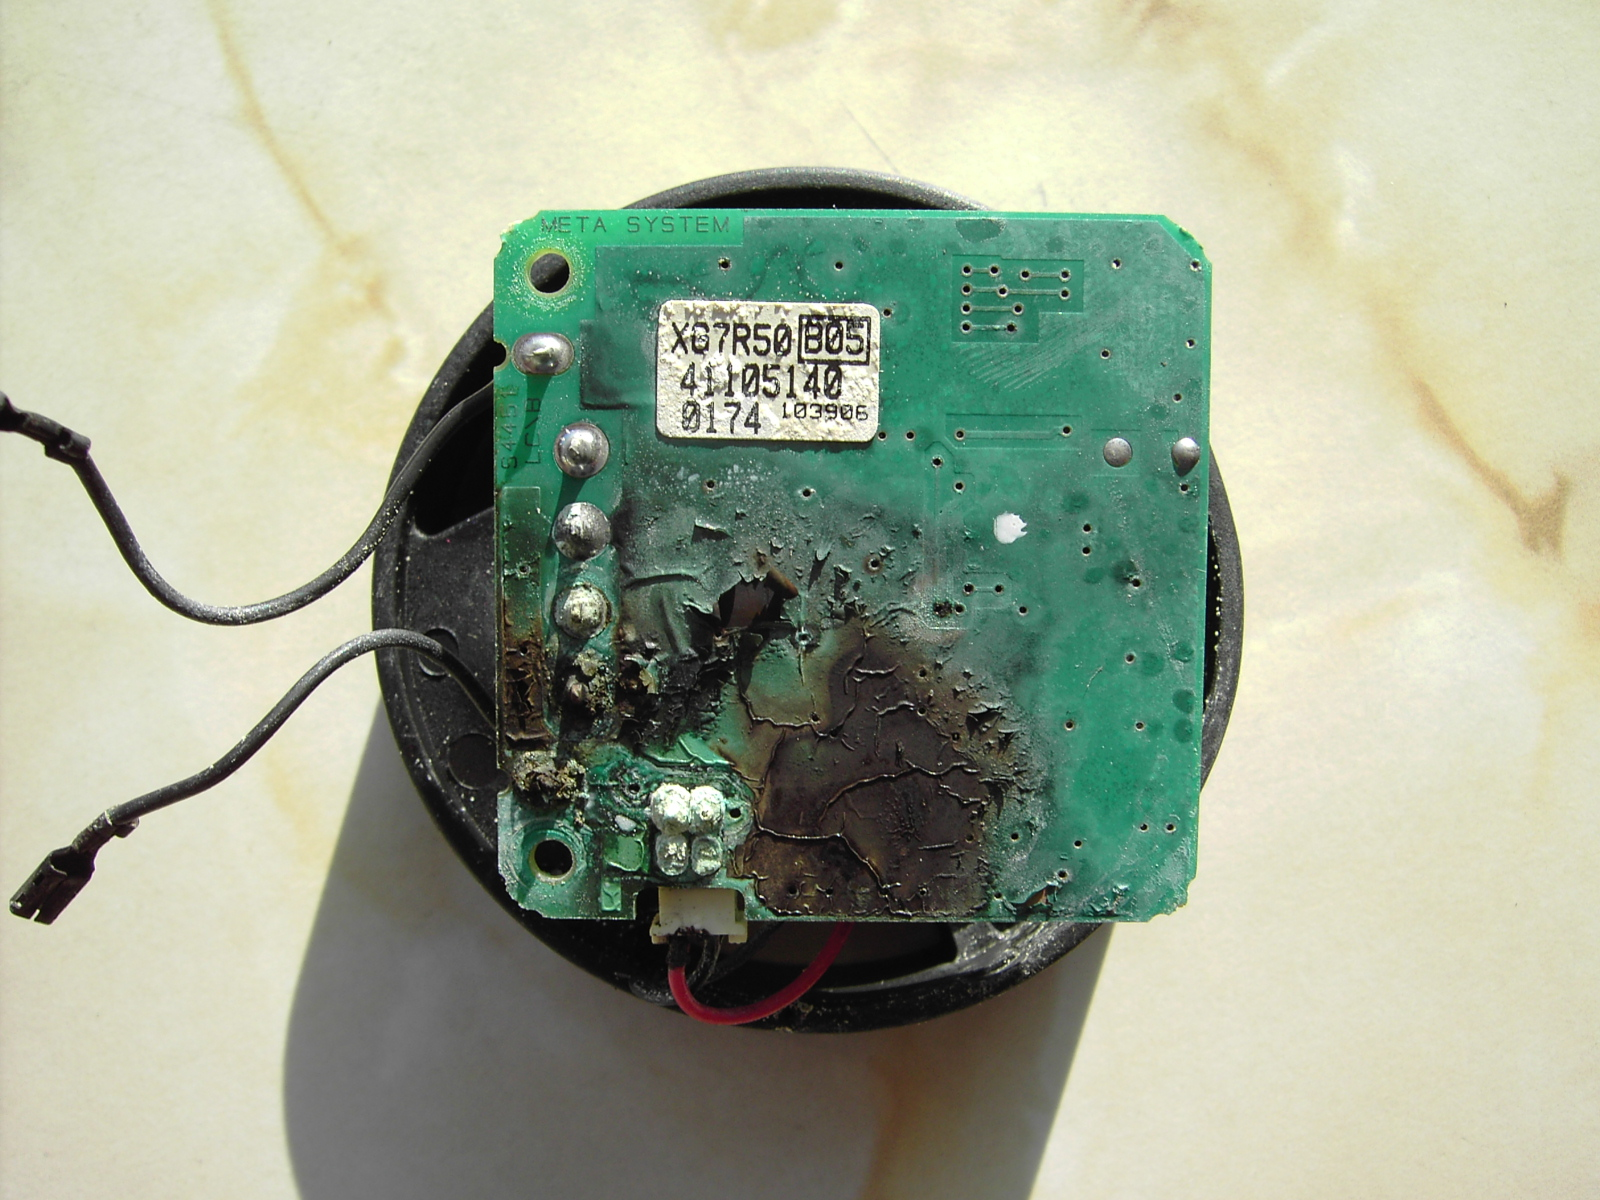 Click image for larger version  Name:Alarm PCB Back.JPG Views:22 Size:755.5 KB ID:200403